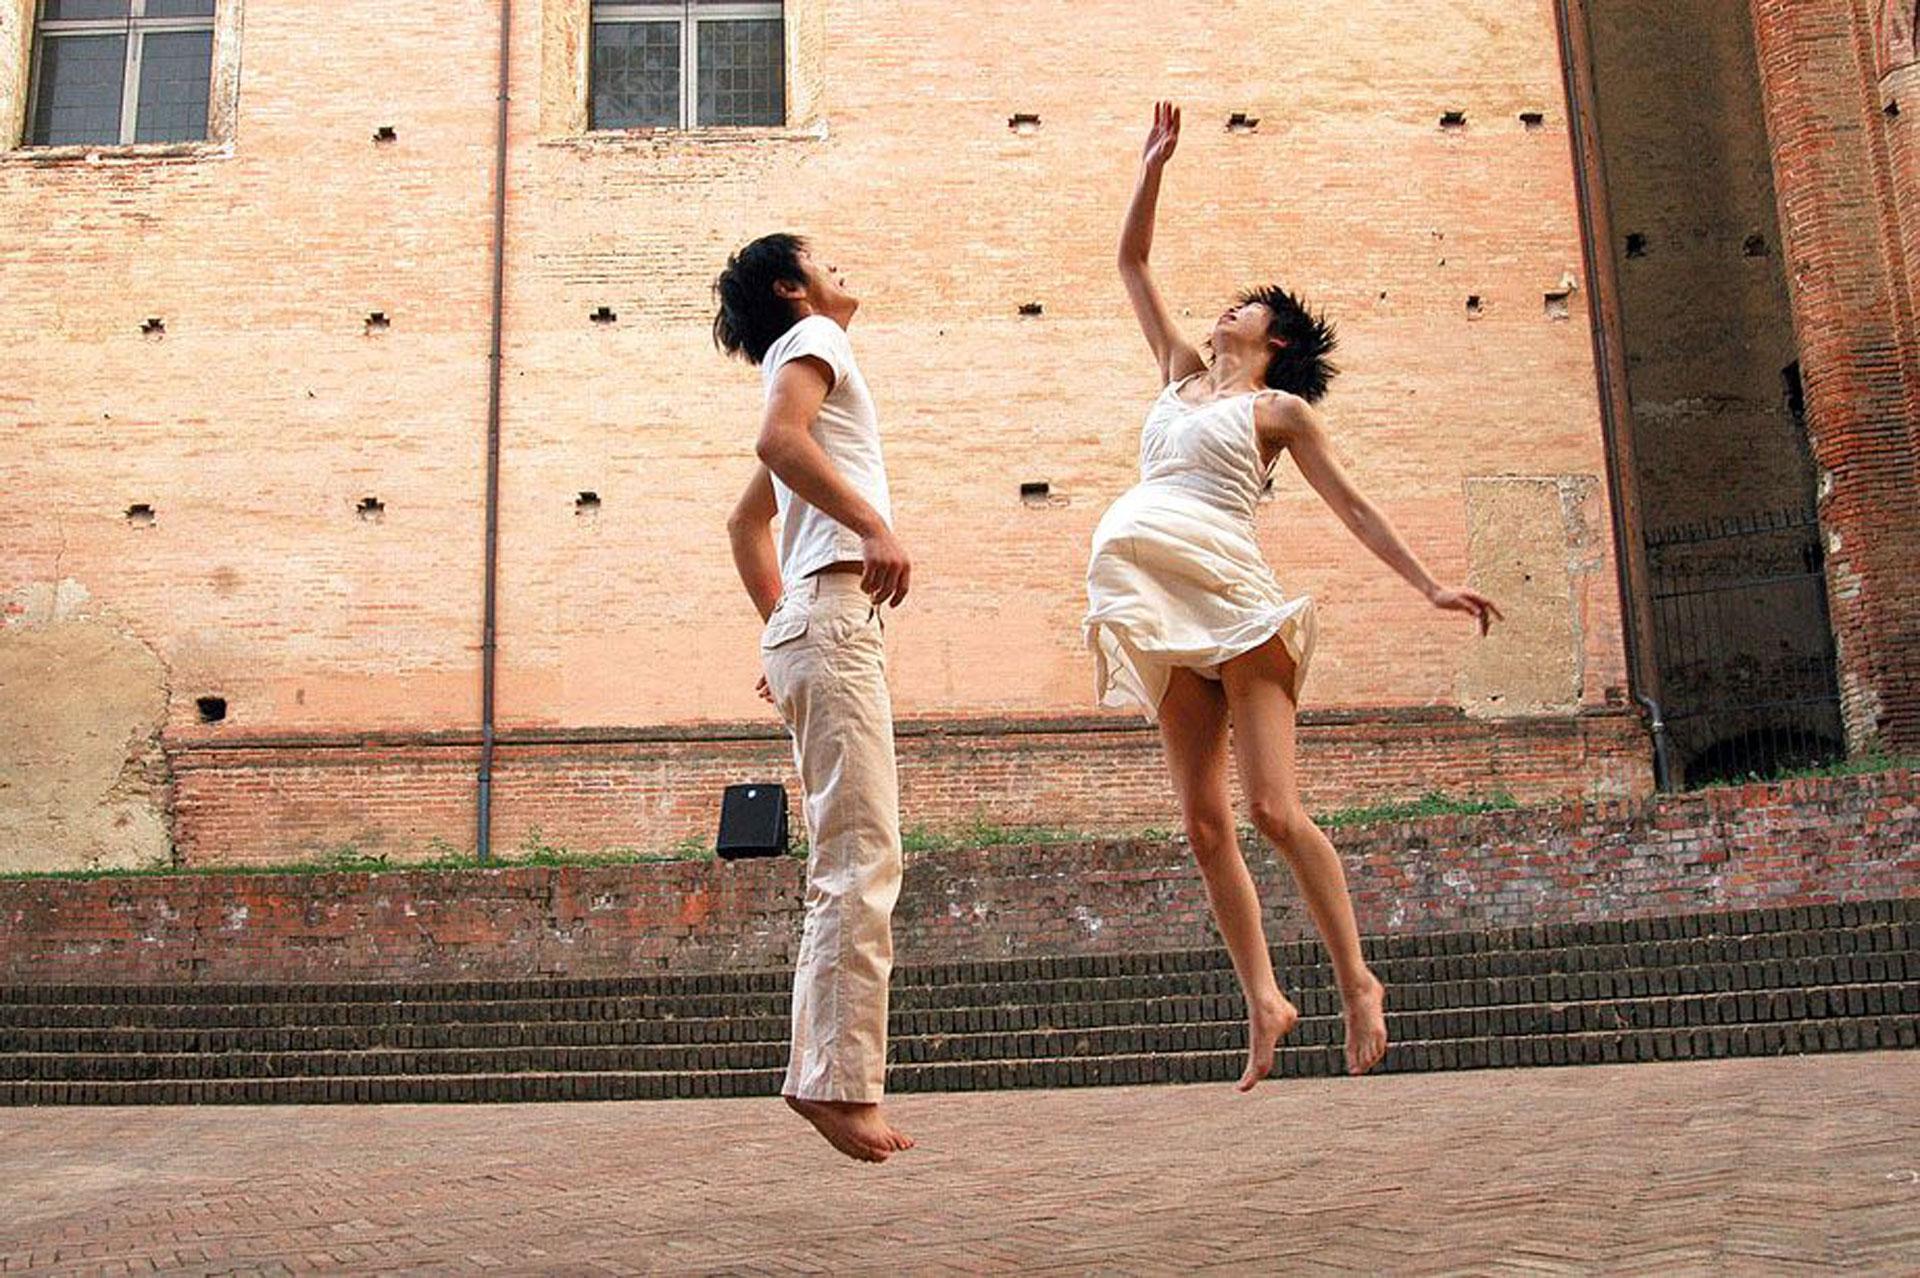 https://www.danzaurbana.eu/associazione/wp-content/uploads/2017/06/donatini1.jpg